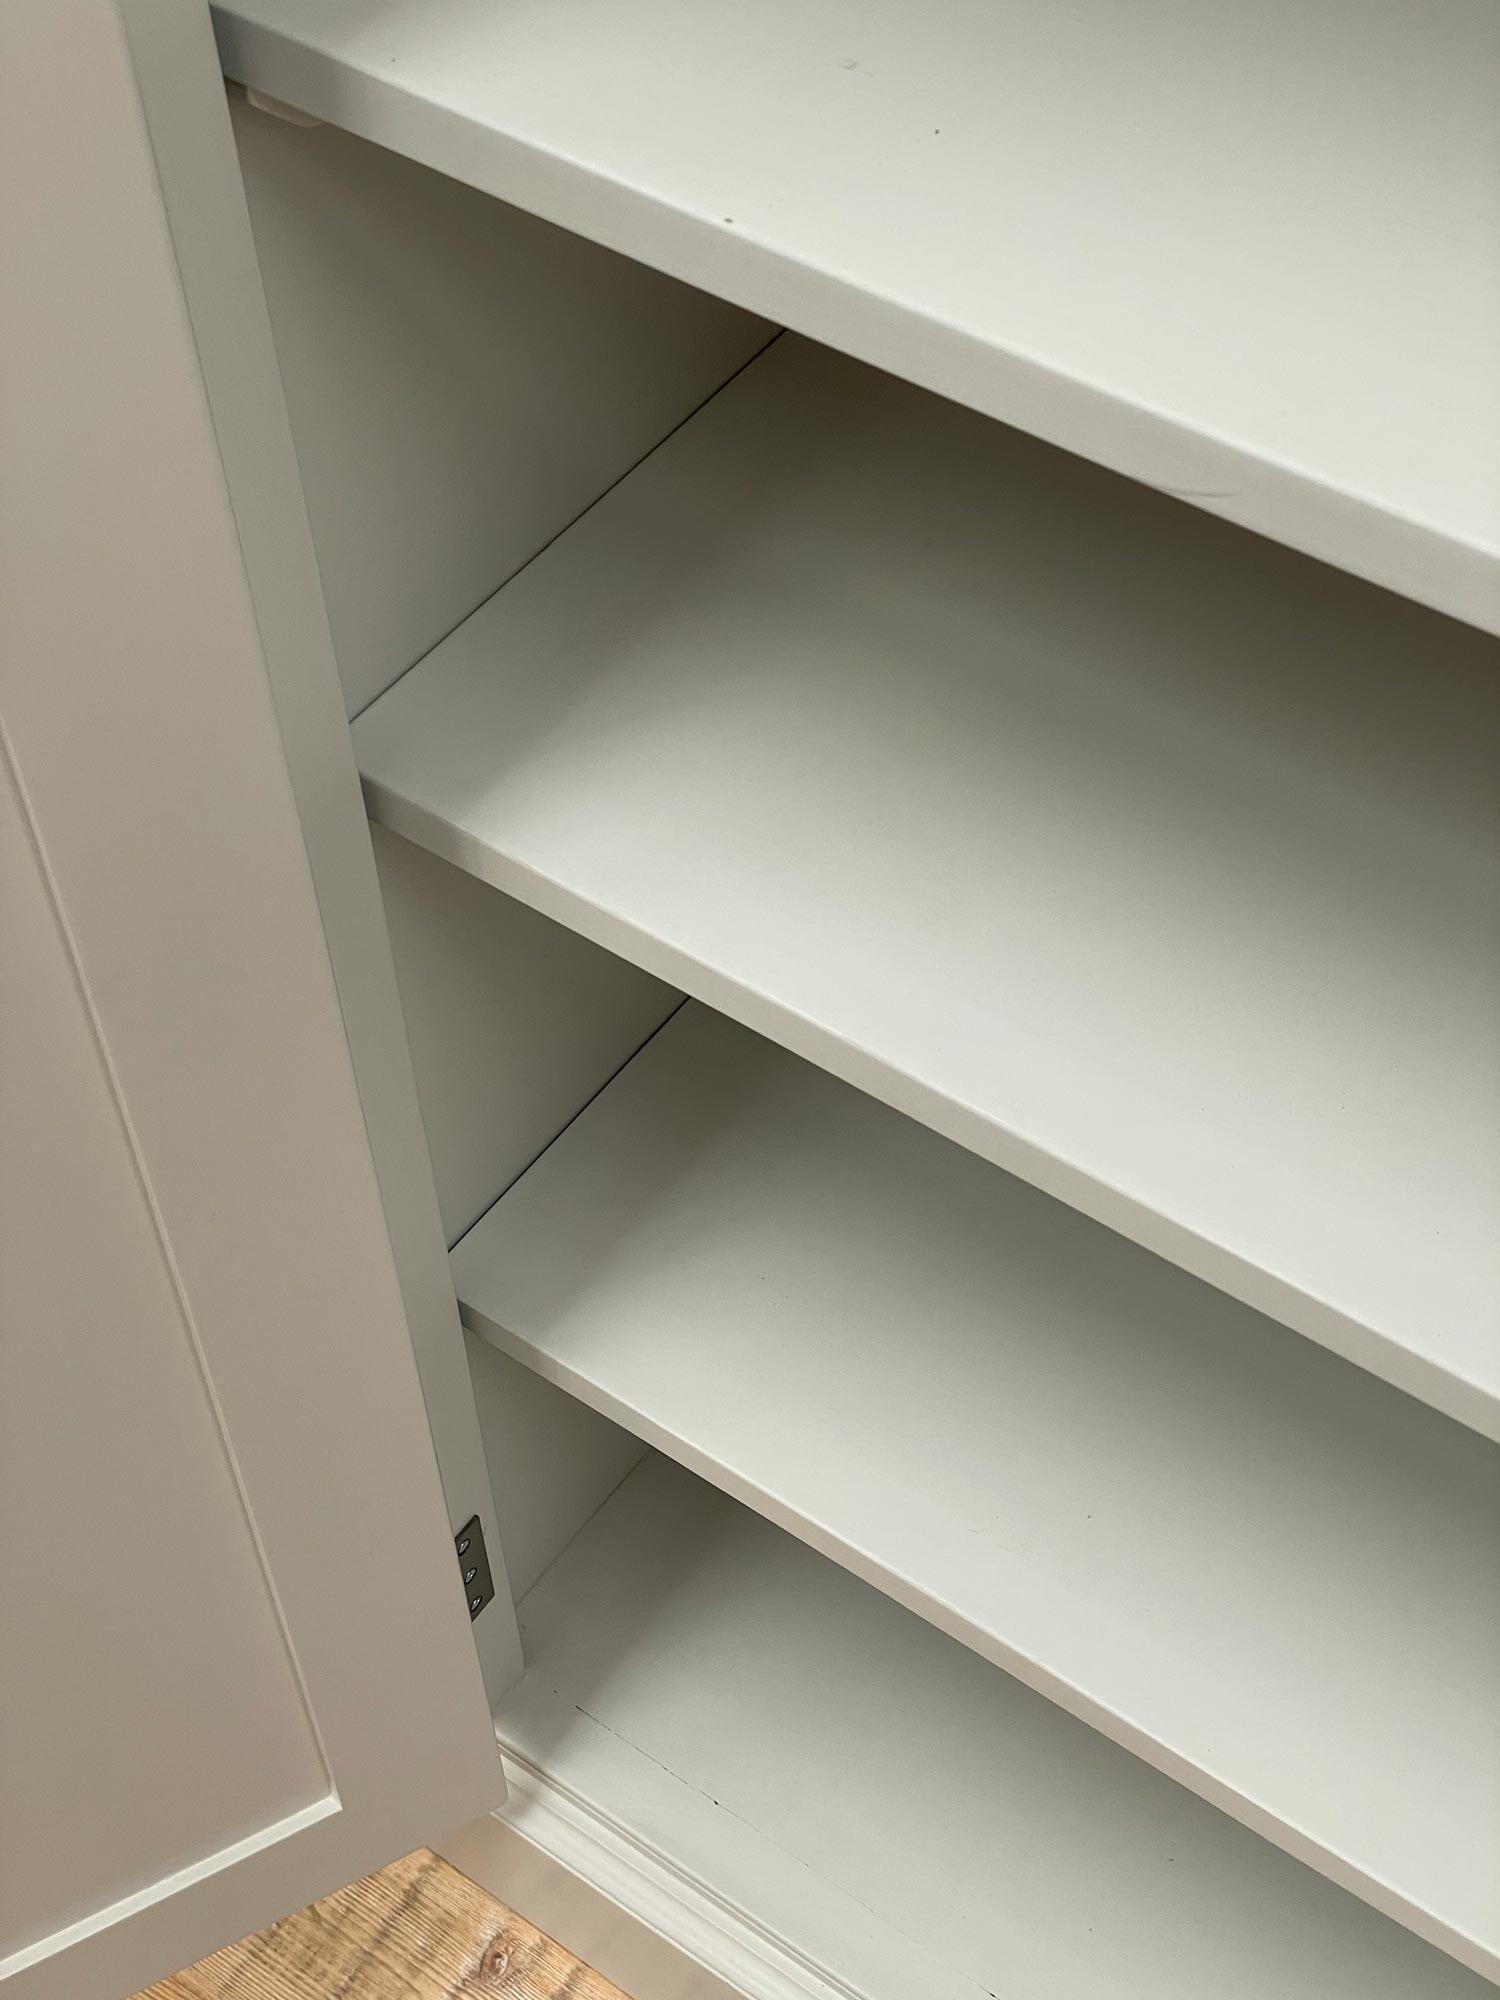 Painted internal shelves